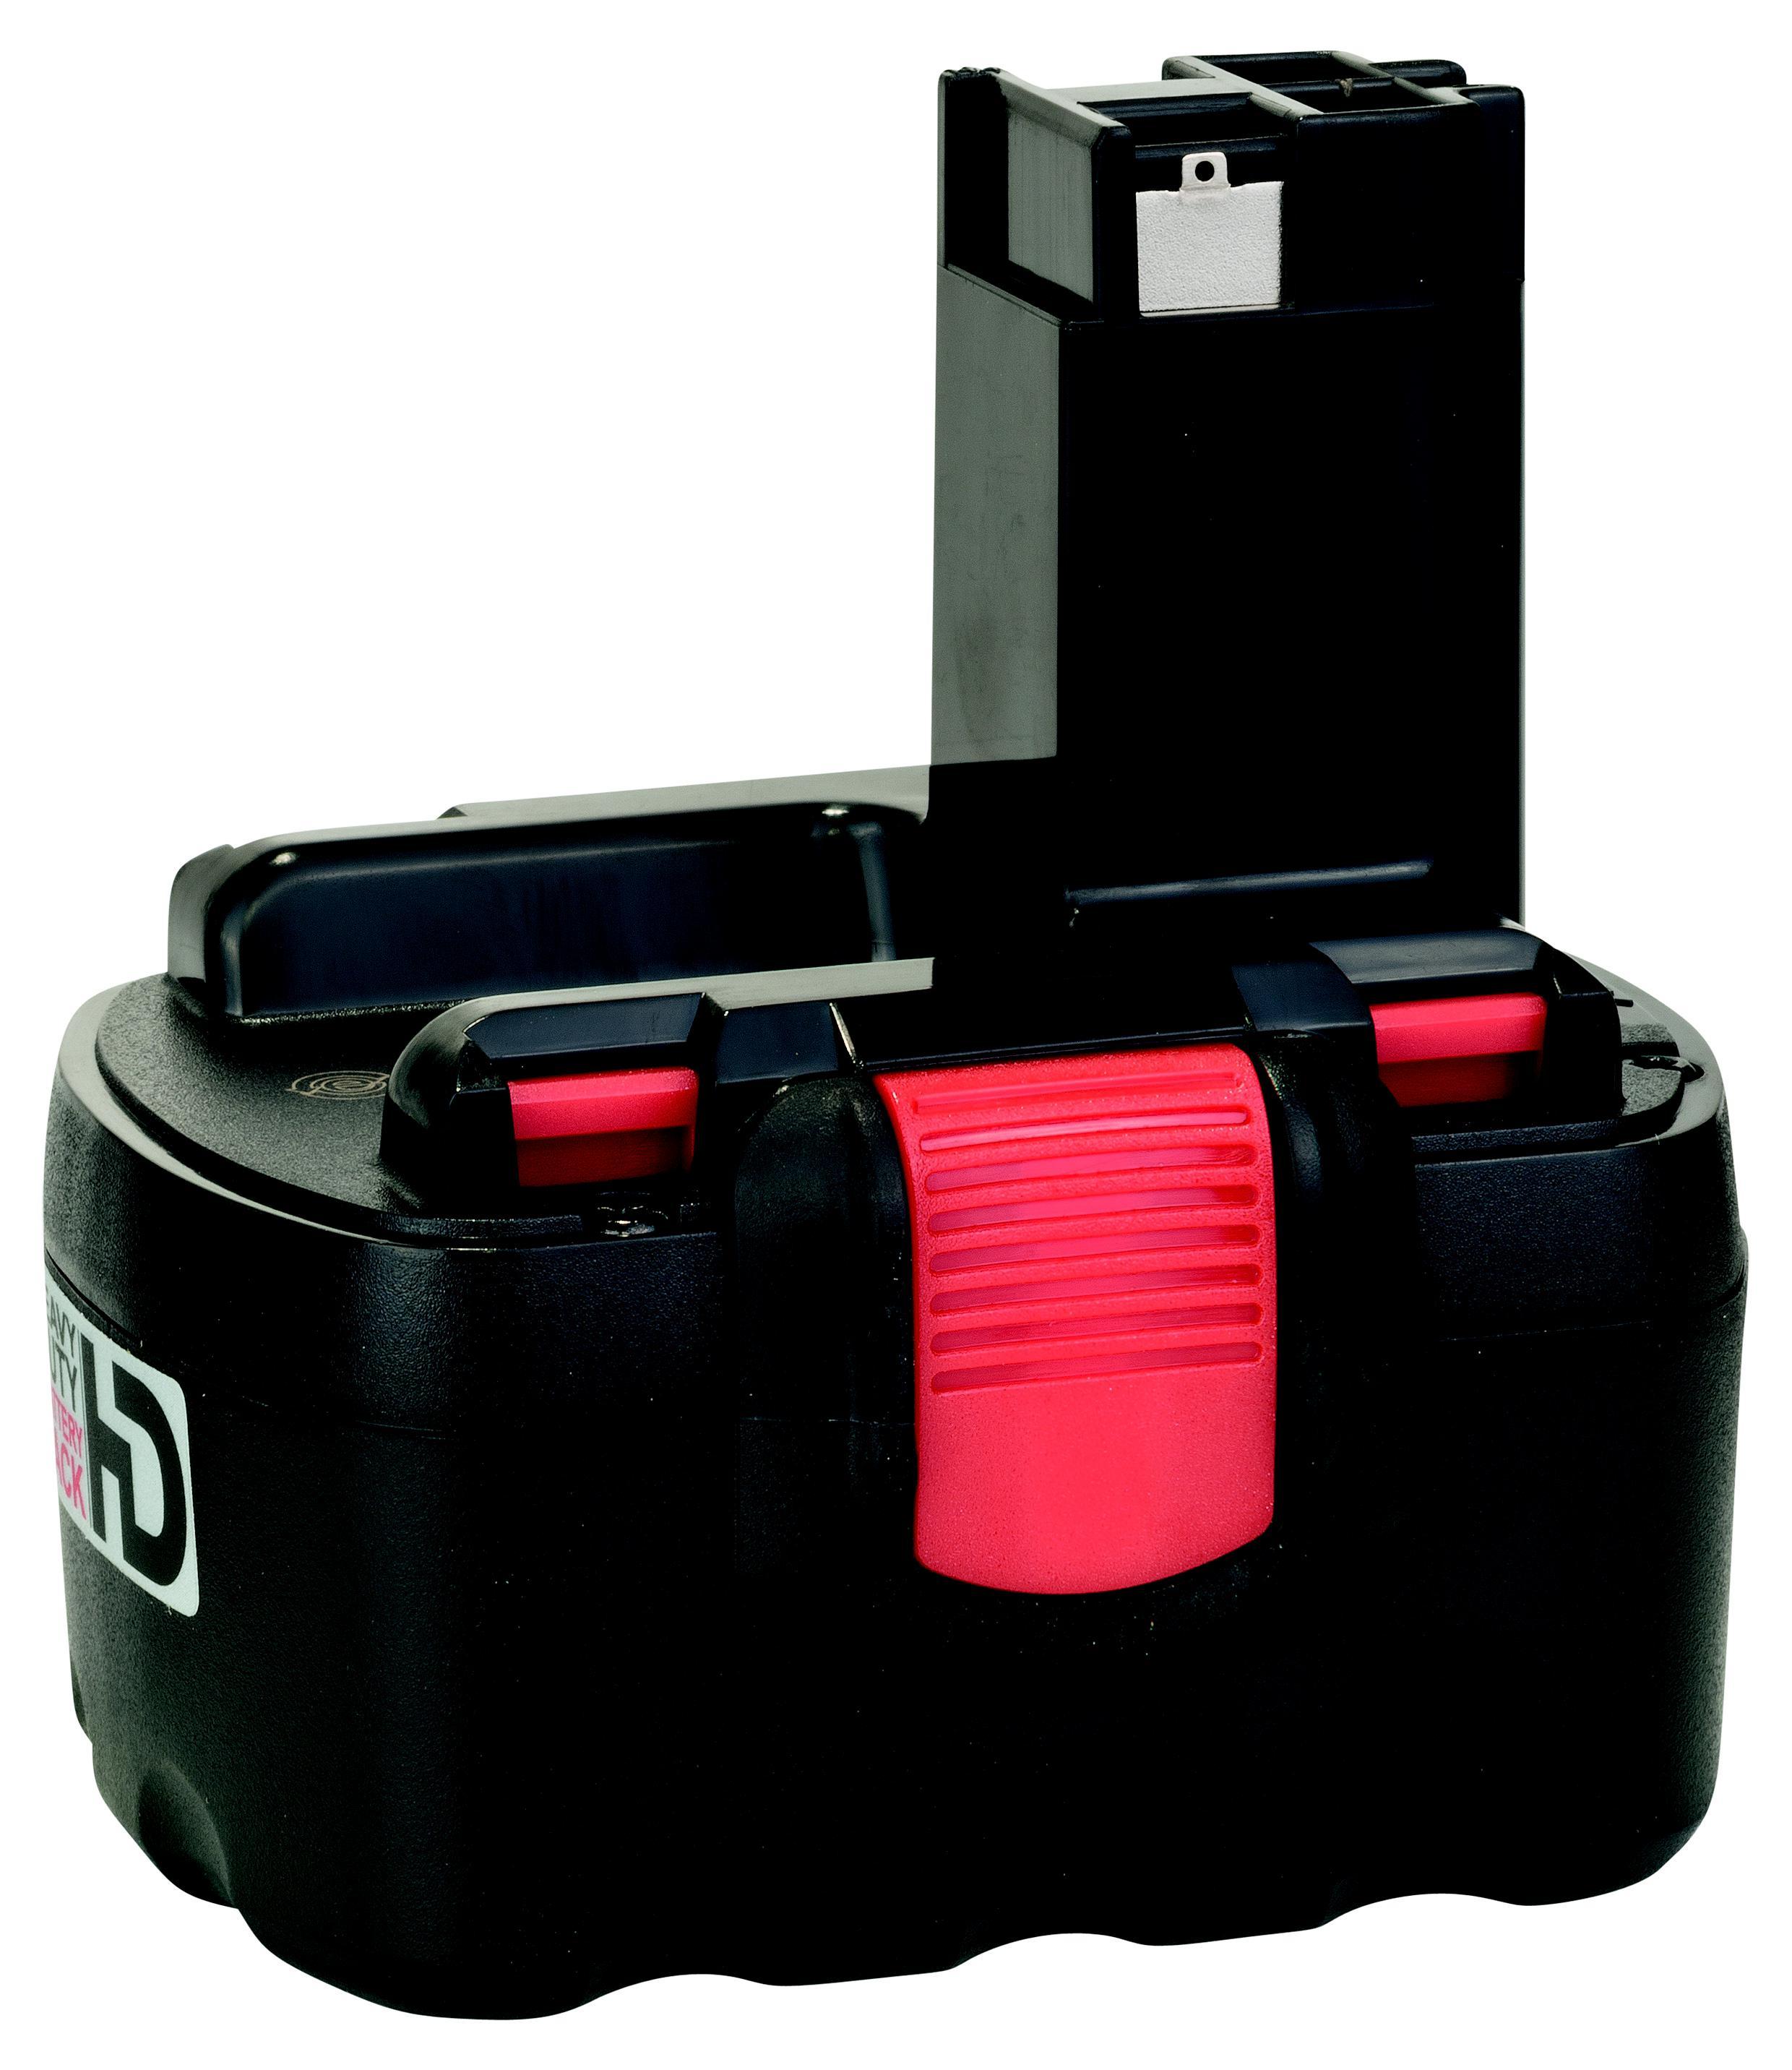 Фото - Аккумулятор Bosch 14.4В2.6Ач nimh (2.607.335.686) аккумулятор